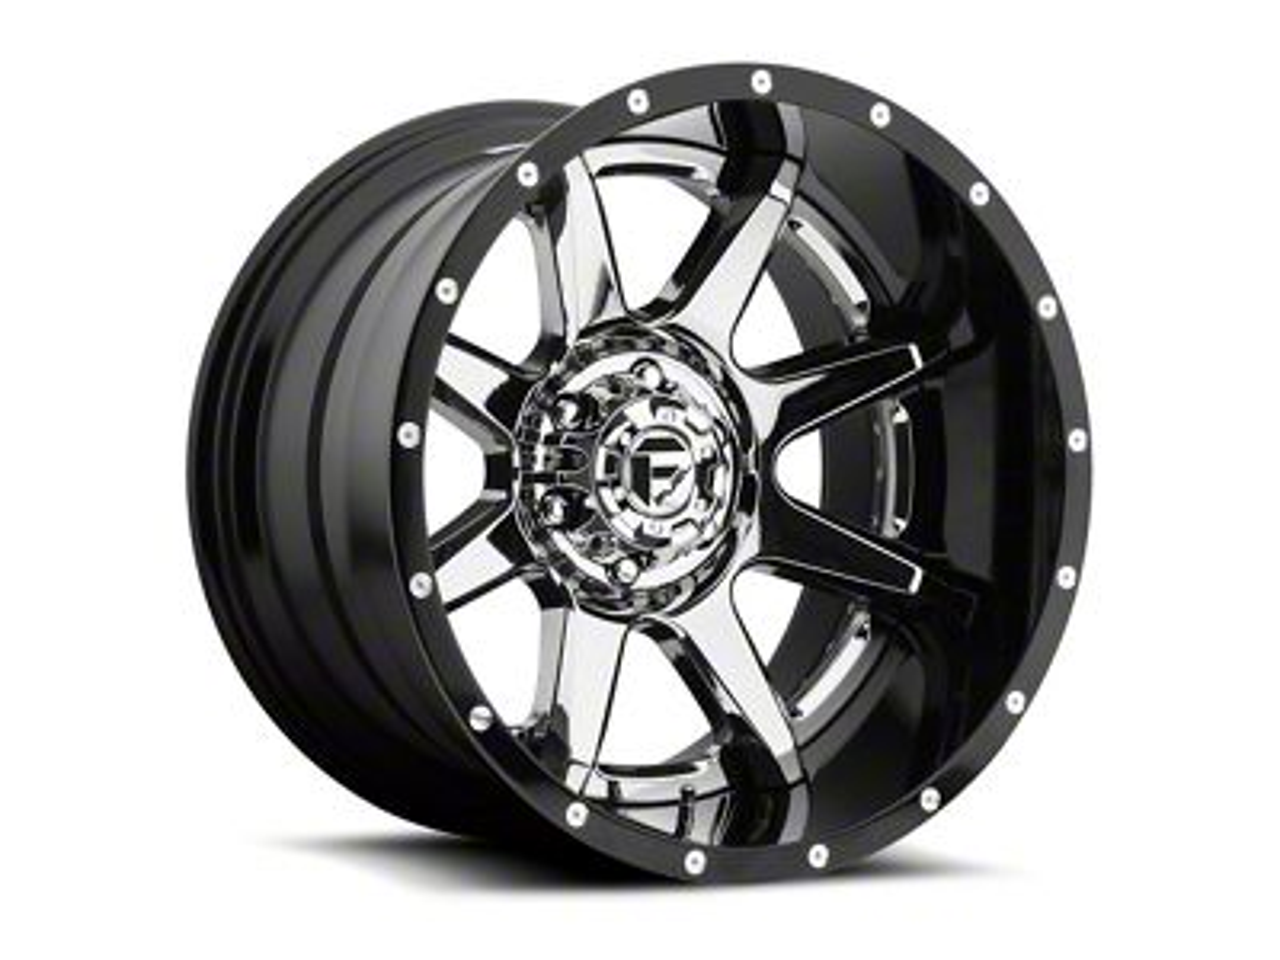 Fuel Wheels Rampage Chrome 5-Lug Wheel - 20x12 (02-18 RAM 1500, Excluding Mega Cab)